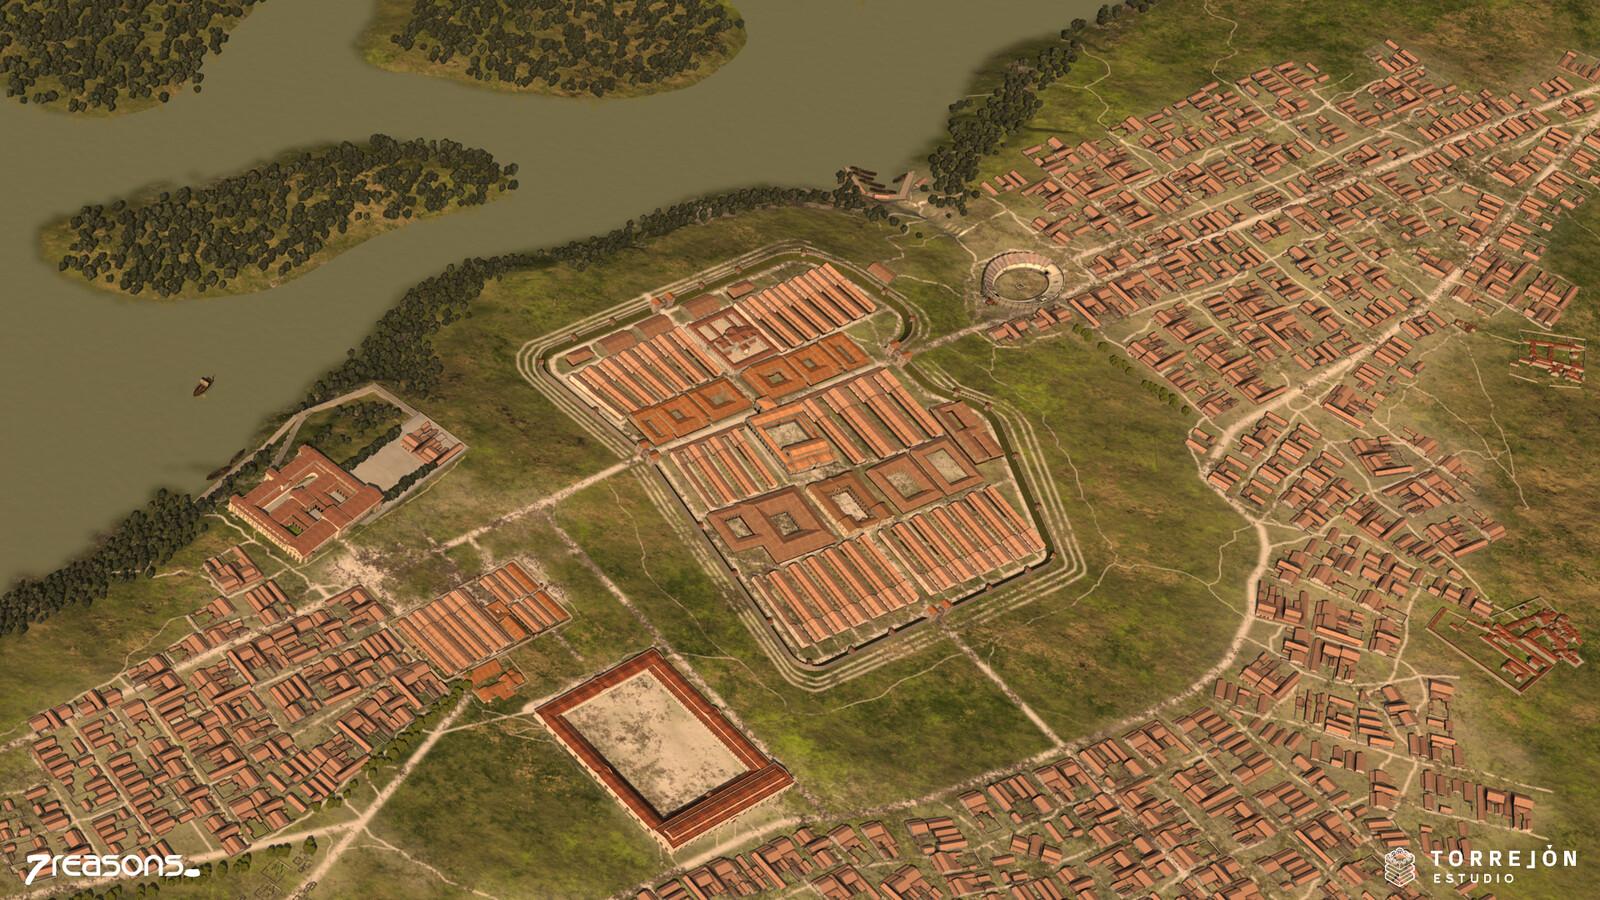 Carnuntum - Legionary Fort 3D visualisation